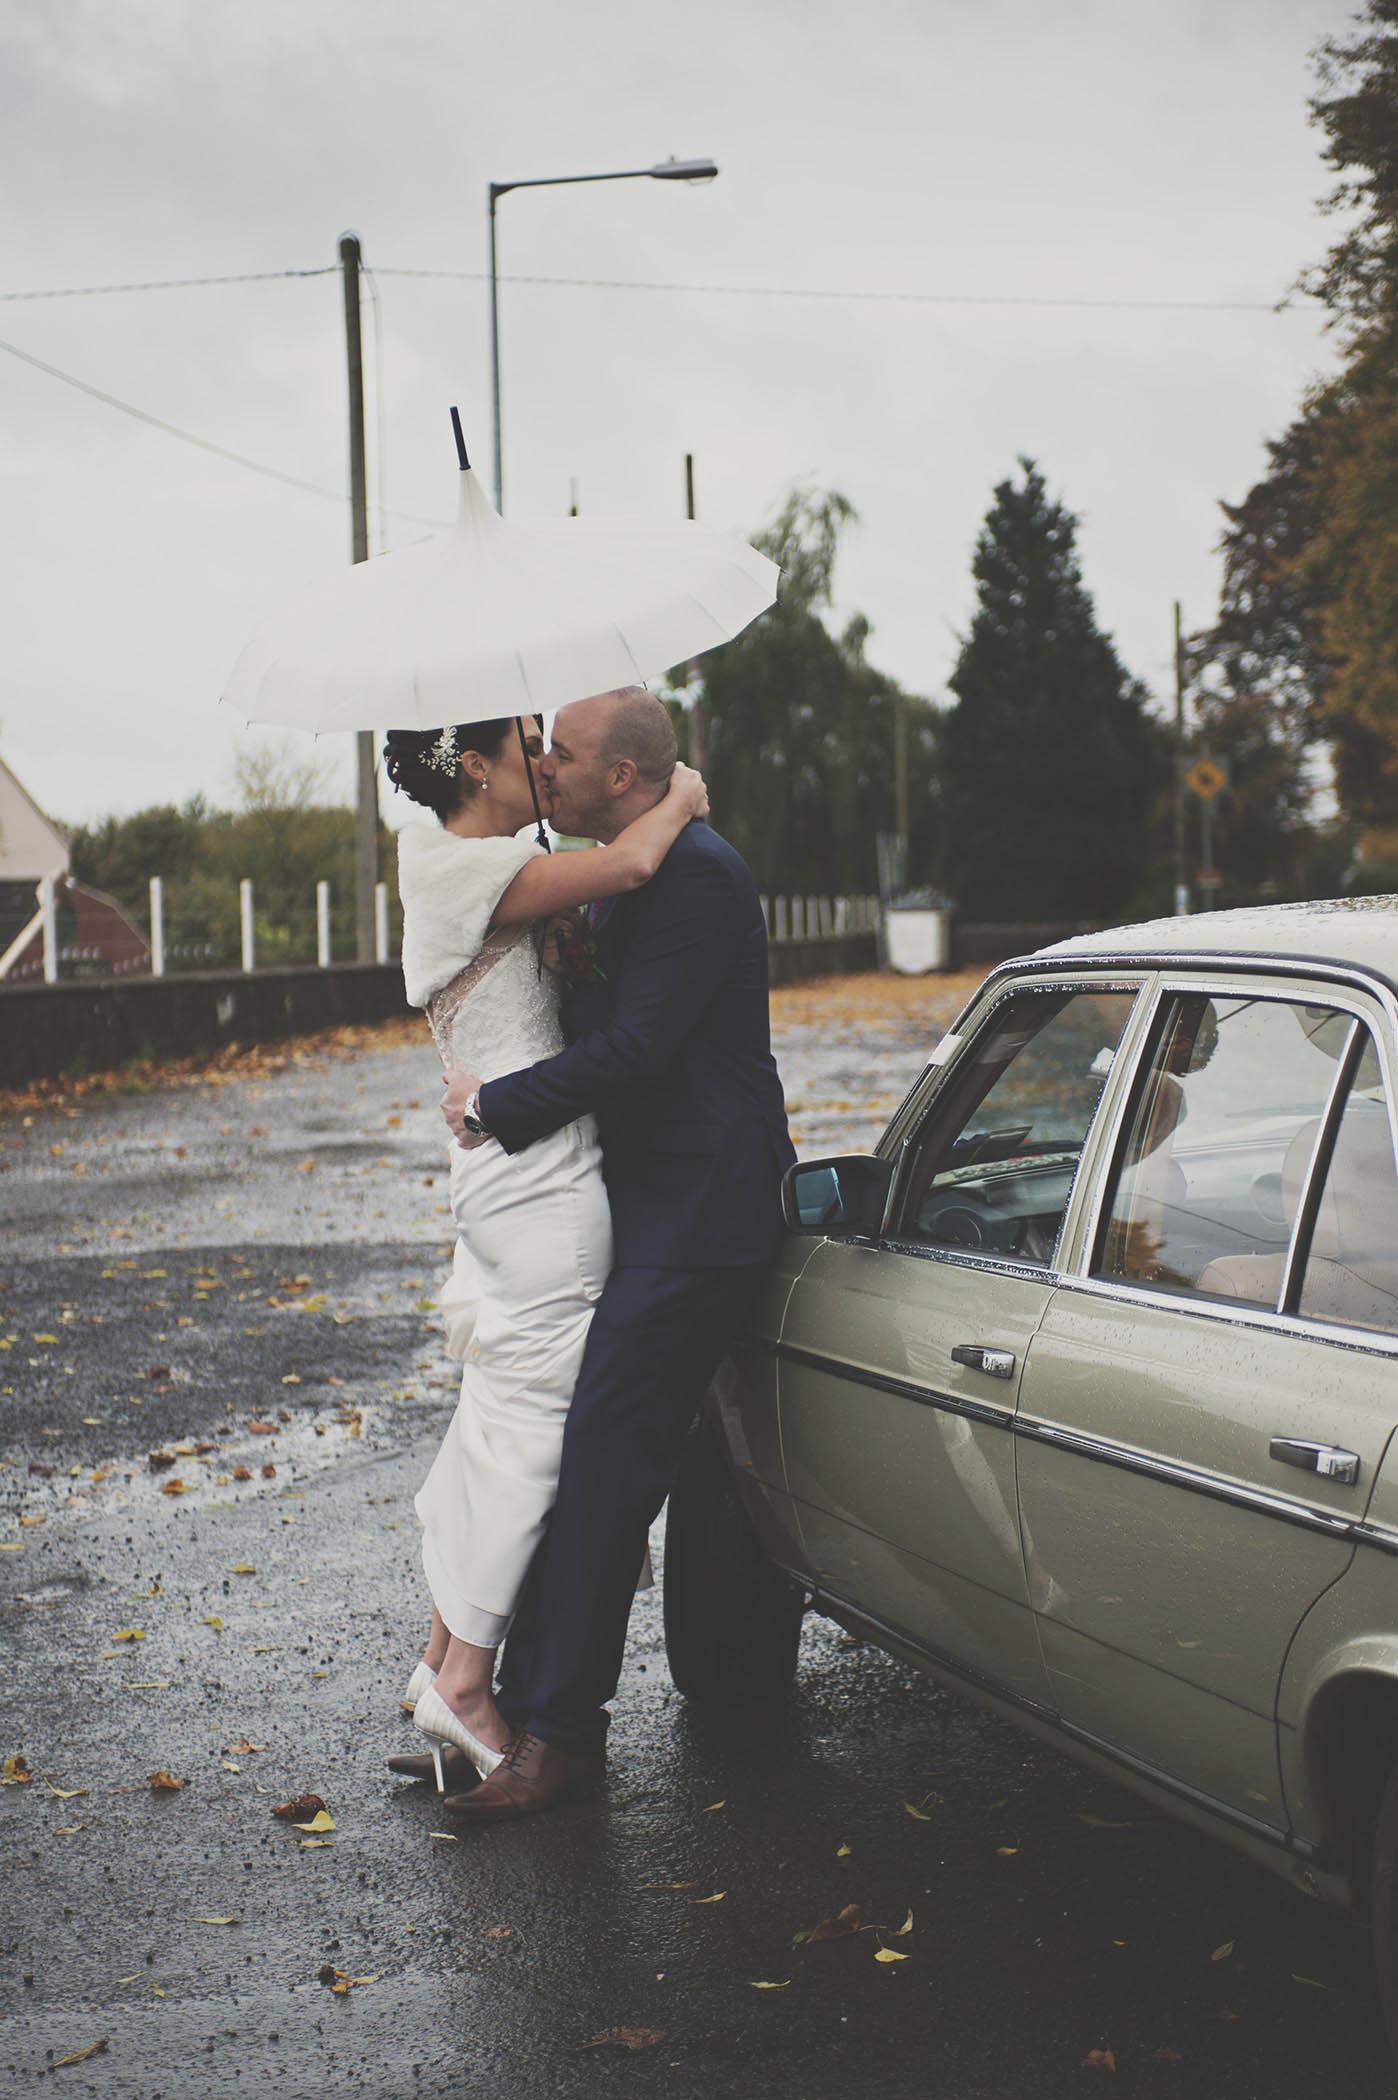 Wedding couple kiss under umbrella